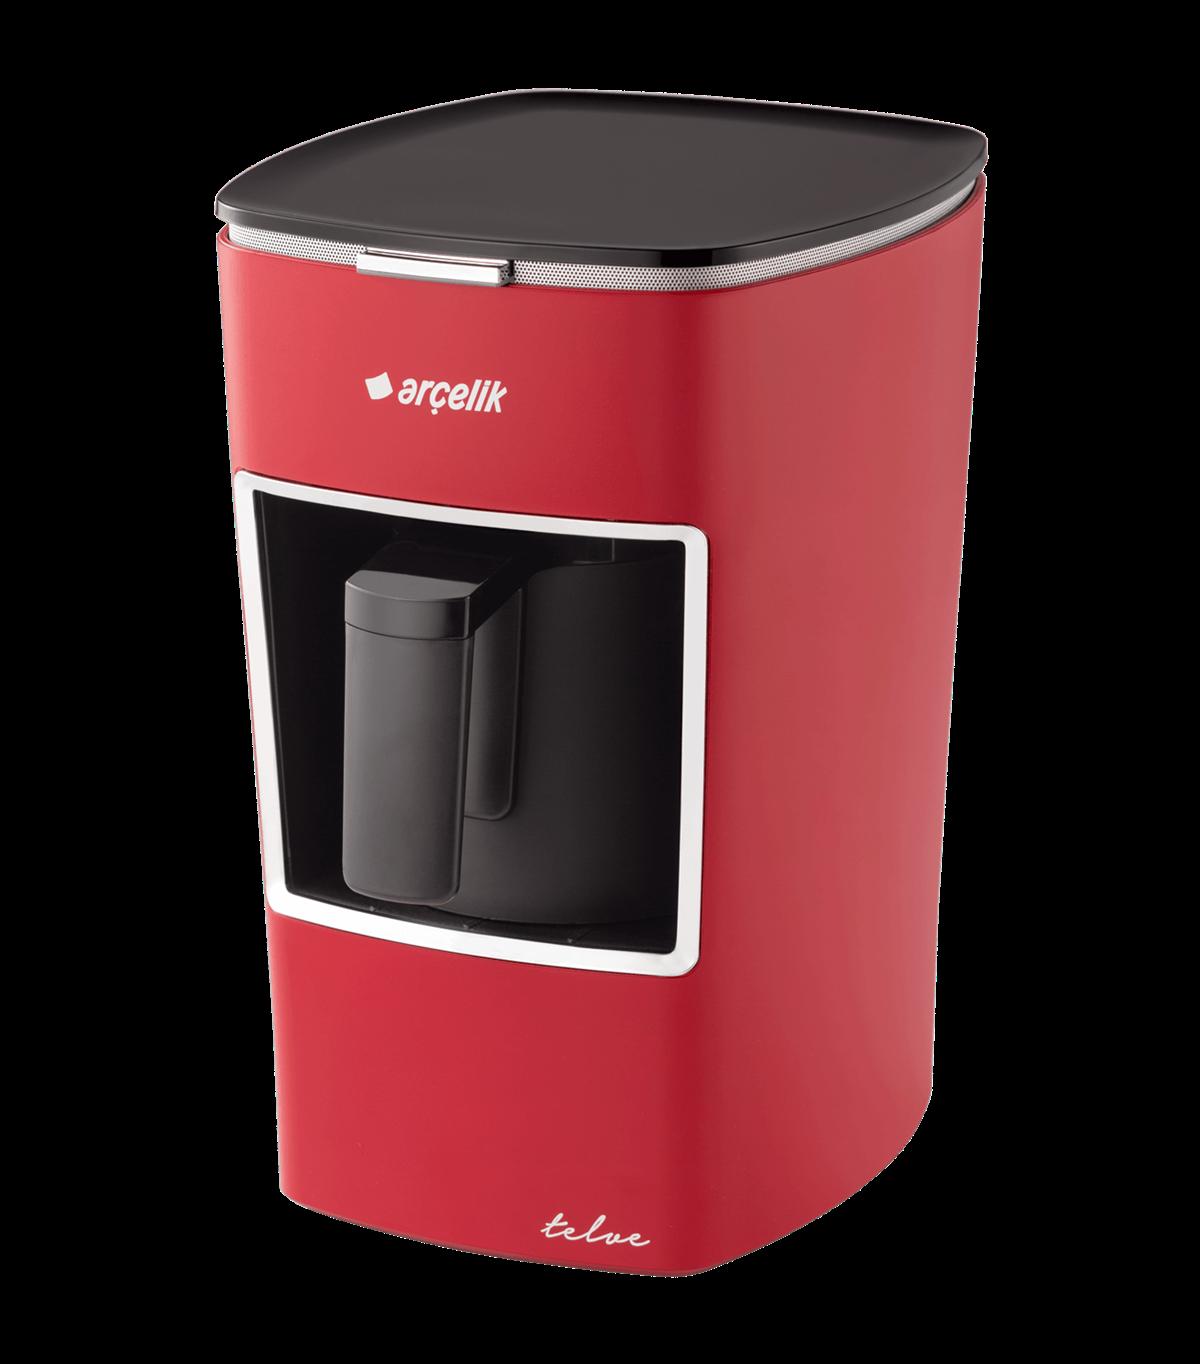 Arcelik K 3300 White Mini Coffee Machine Turkish Coffee Machine | Automatic | 1 Cup Capacity |